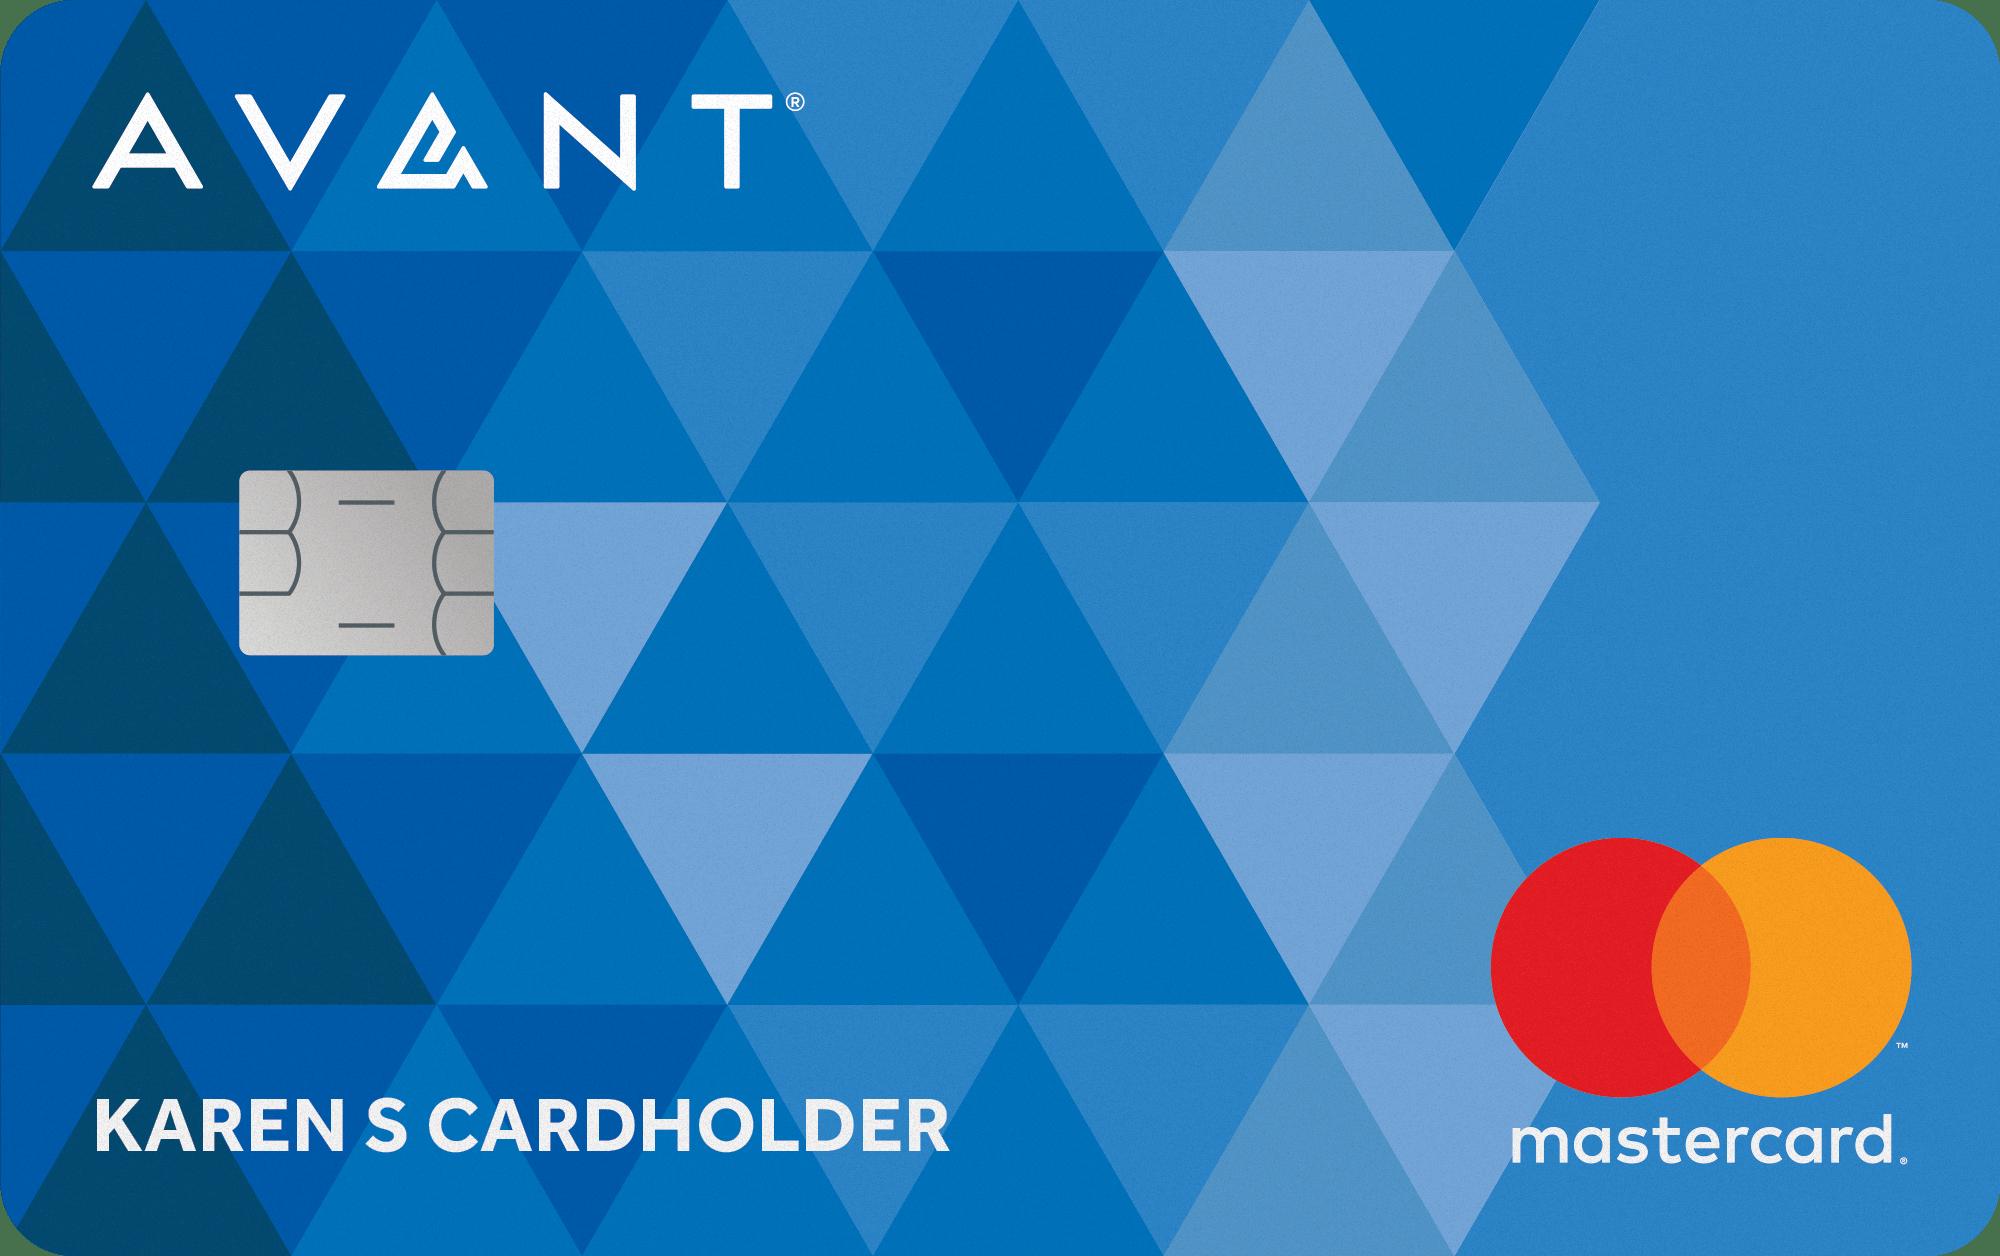 Your reflex credit card